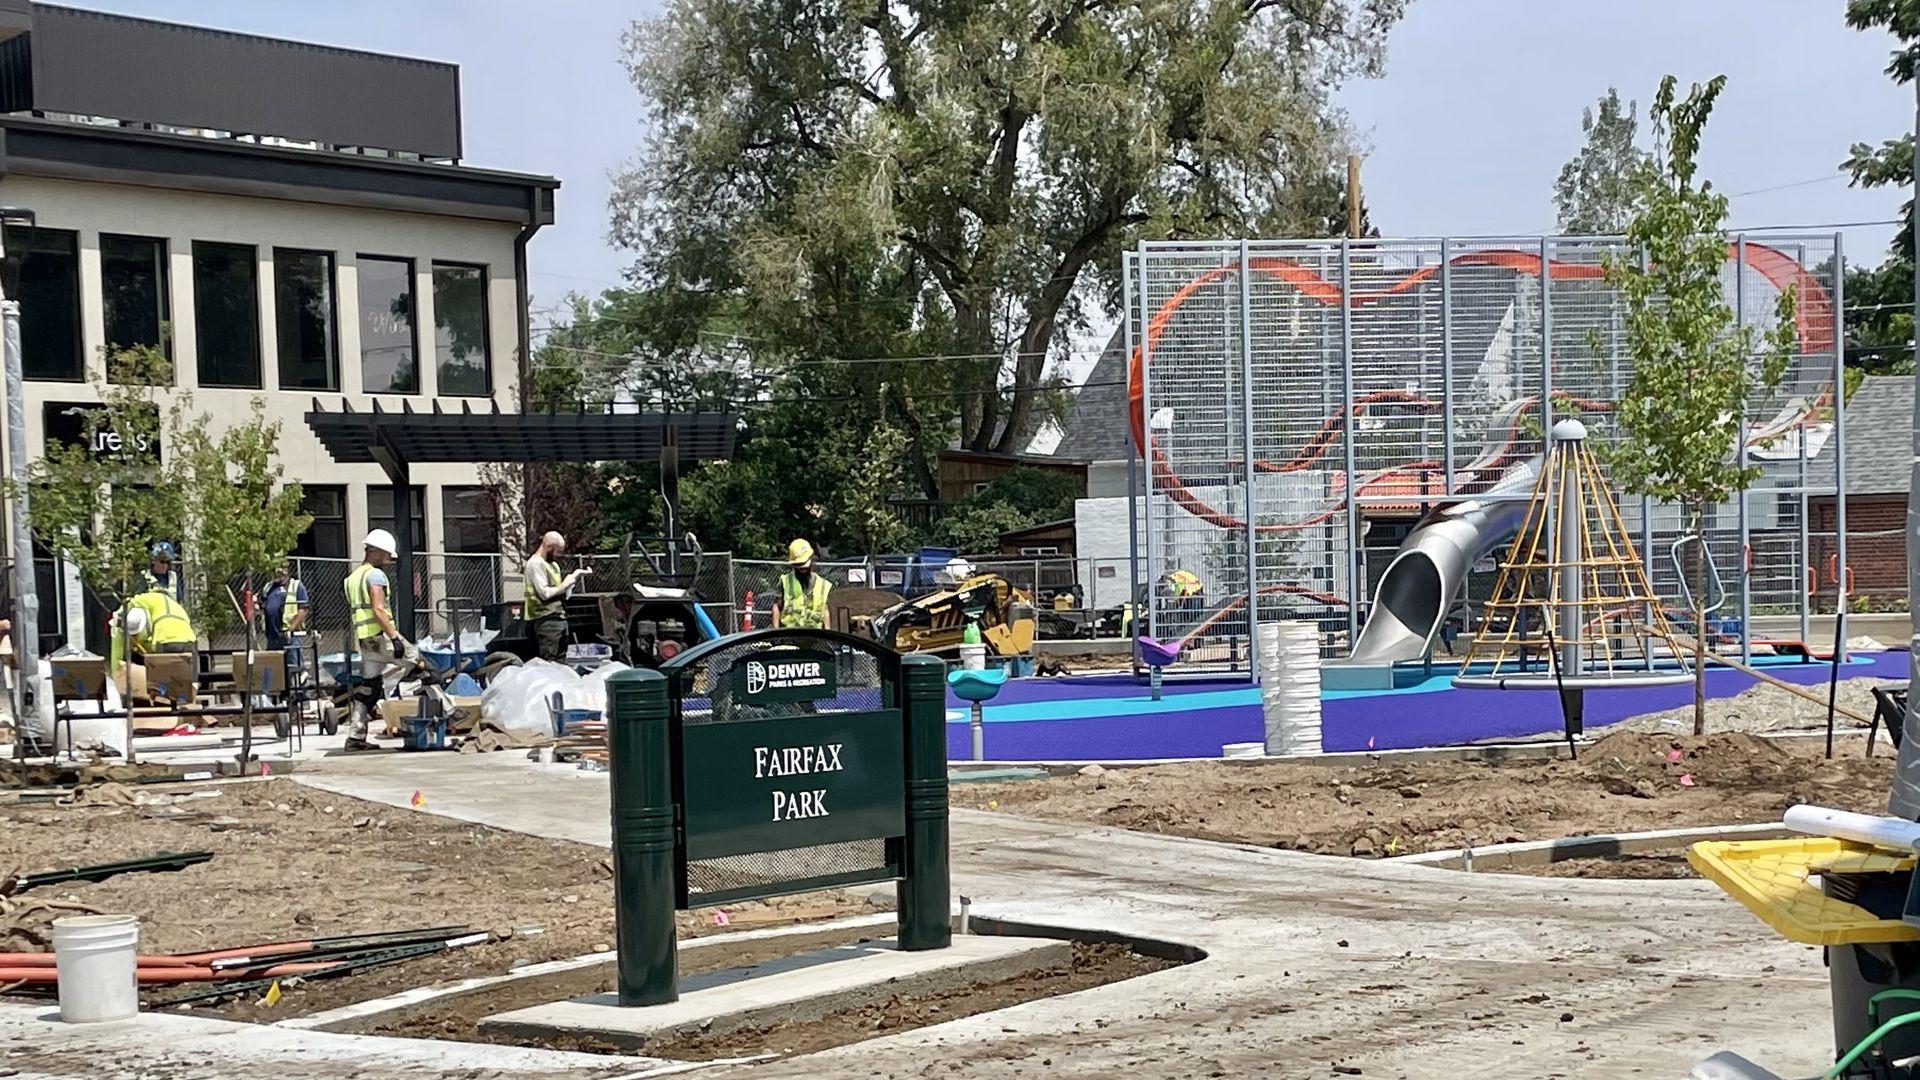 Construction crews work to finish Fairfax Park in Park Hill.